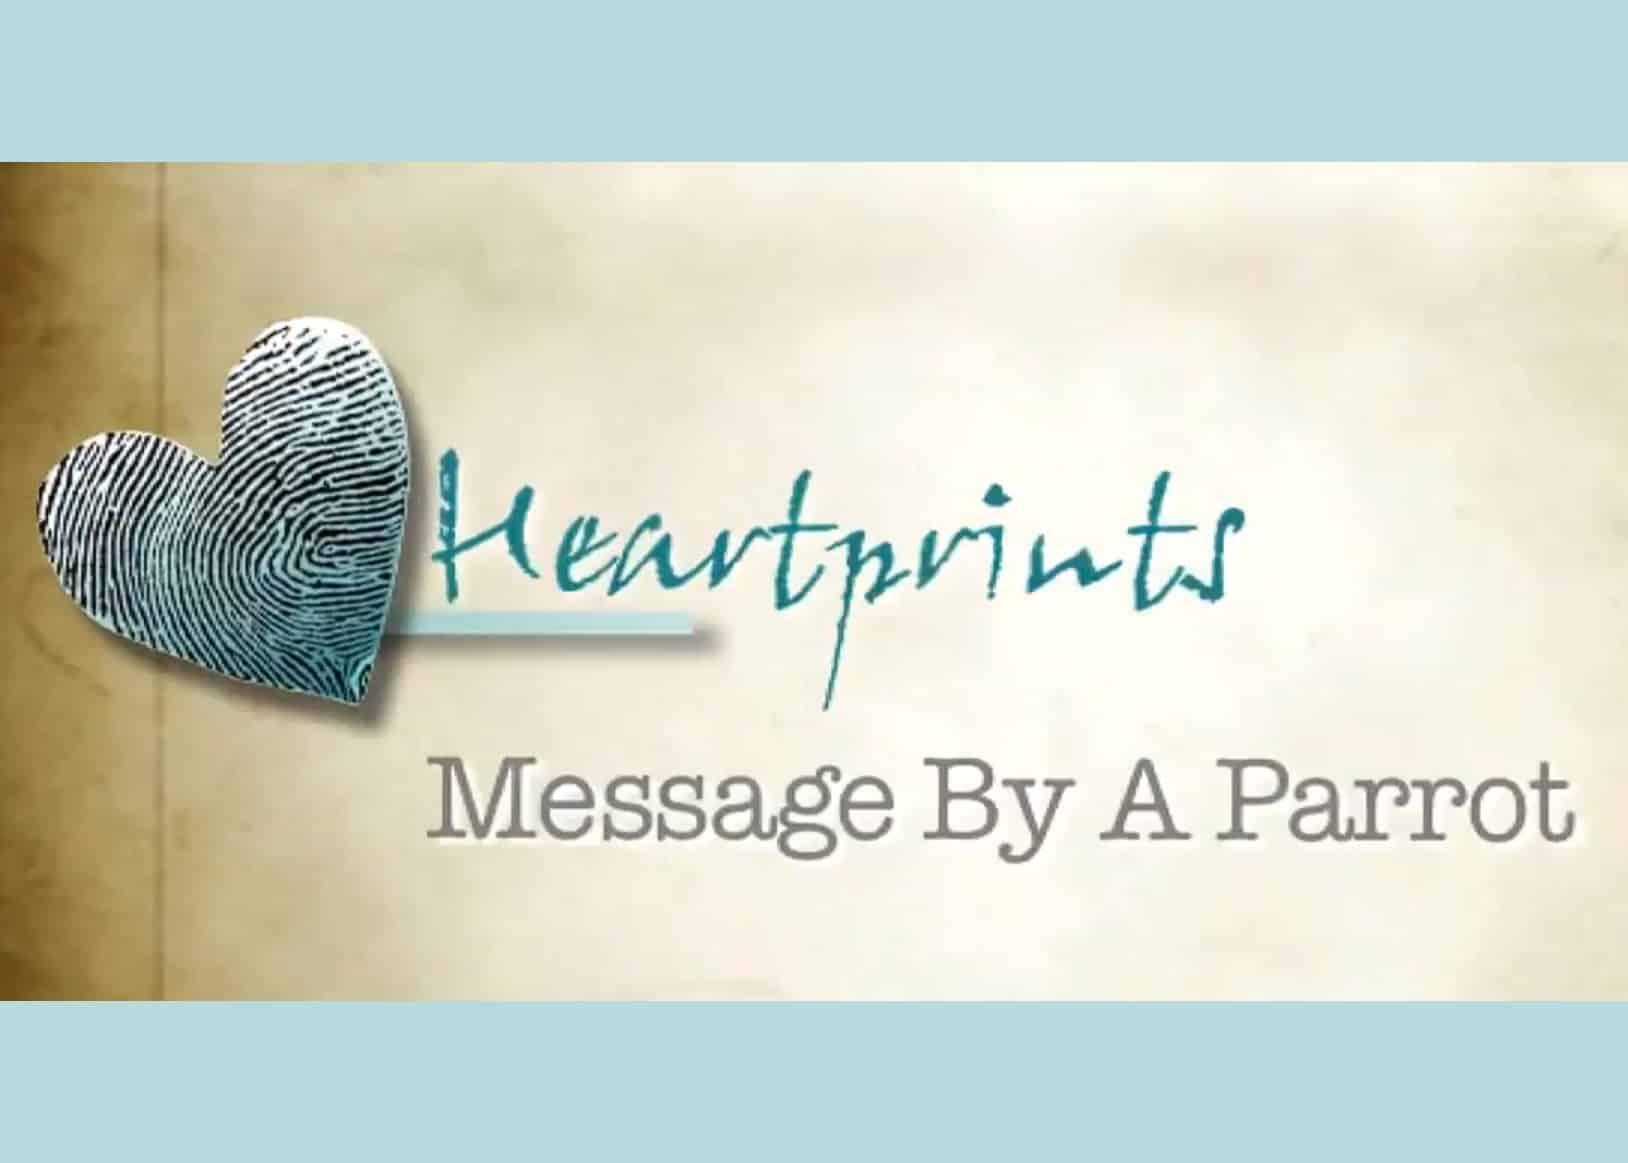 Heartprints Parrot